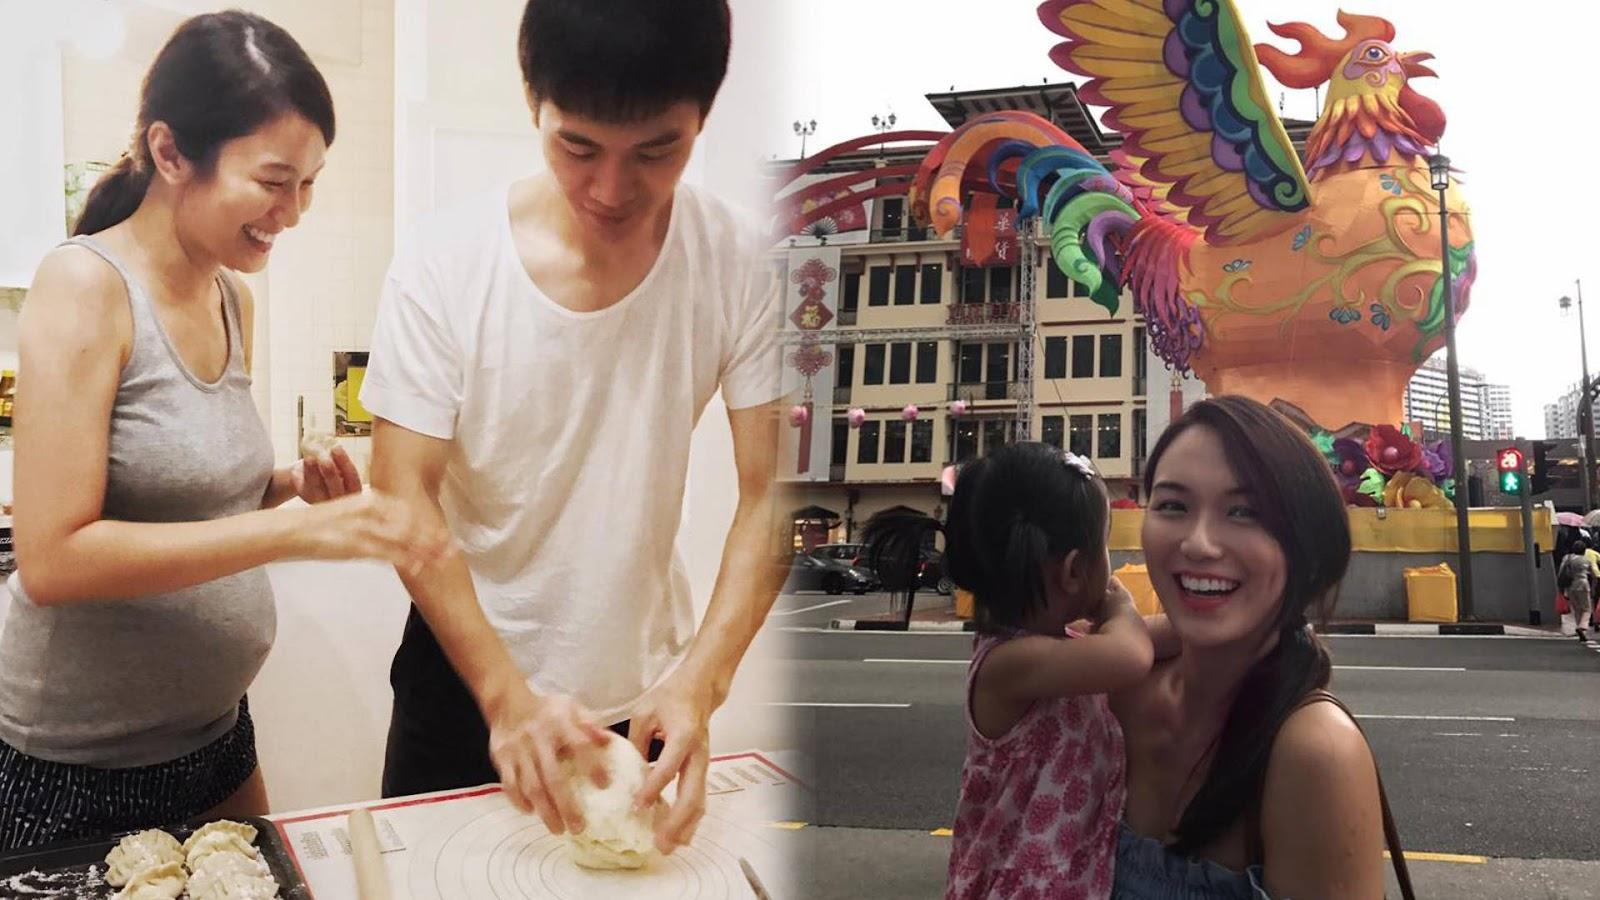 Qi yuwu társkereső joanne peh